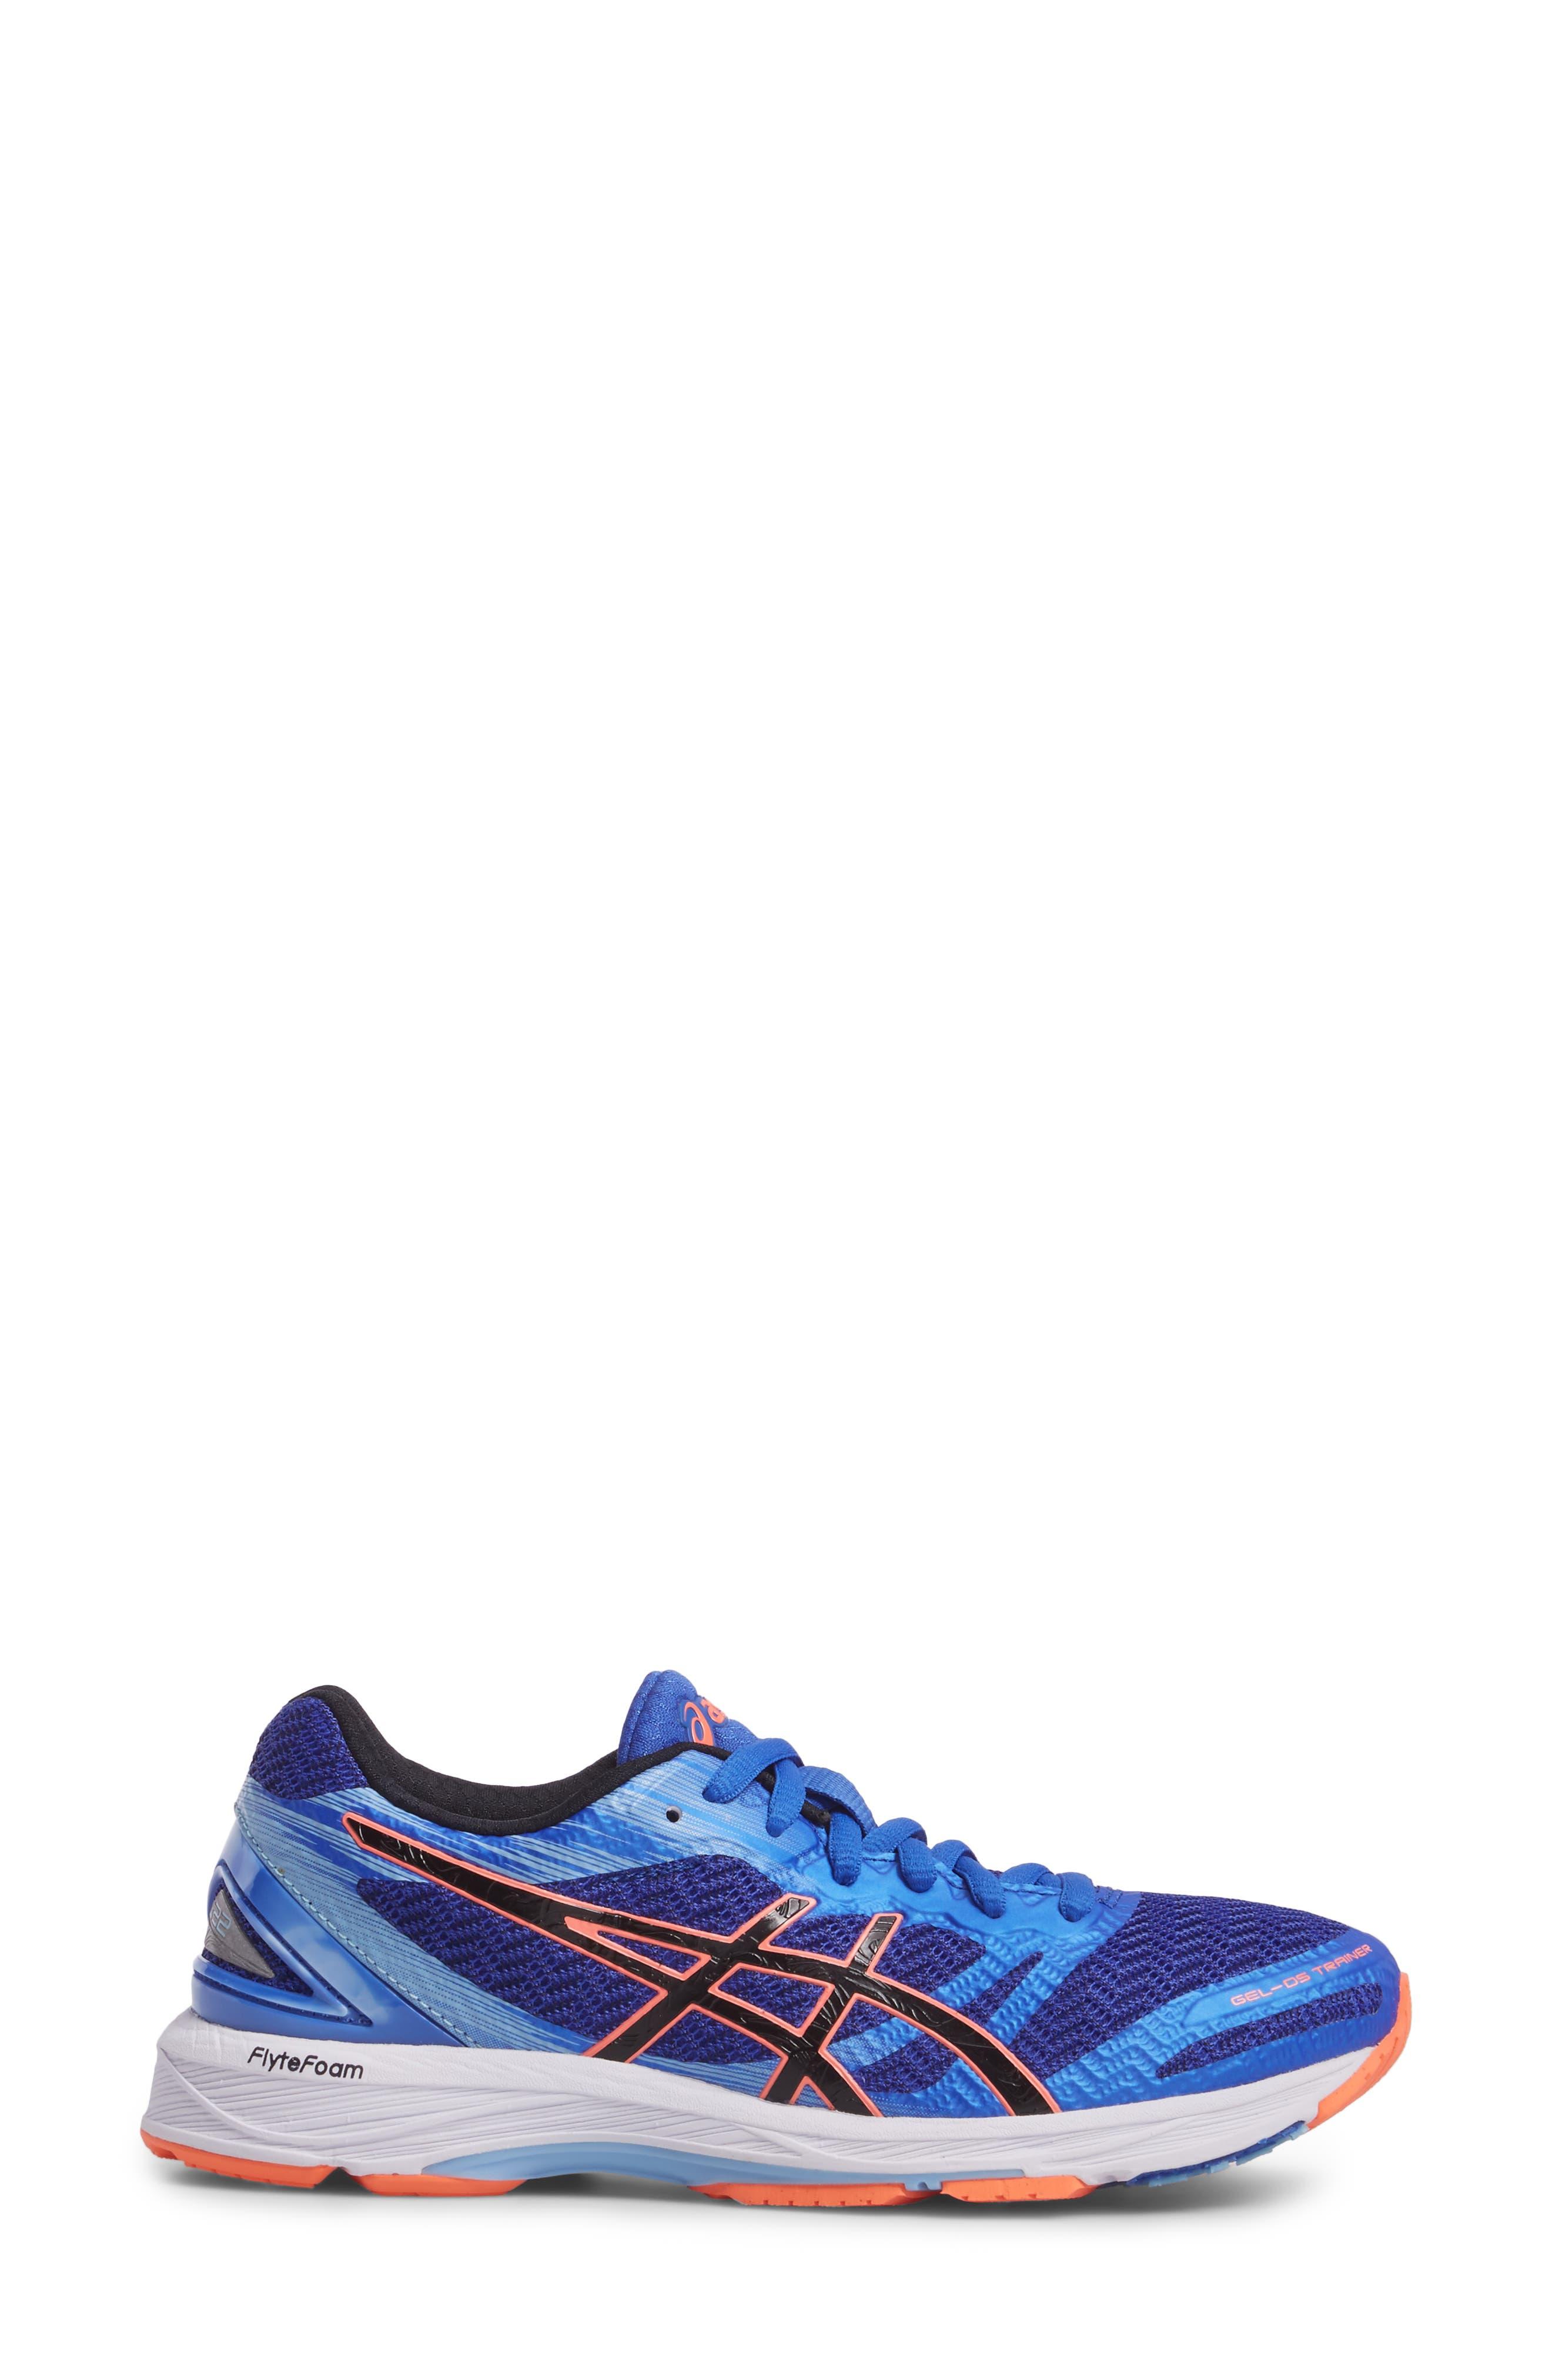 GEL-DS Trainer 22 Running Shoe,                             Alternate thumbnail 3, color,                             Blue Purple/ Black/ Coral